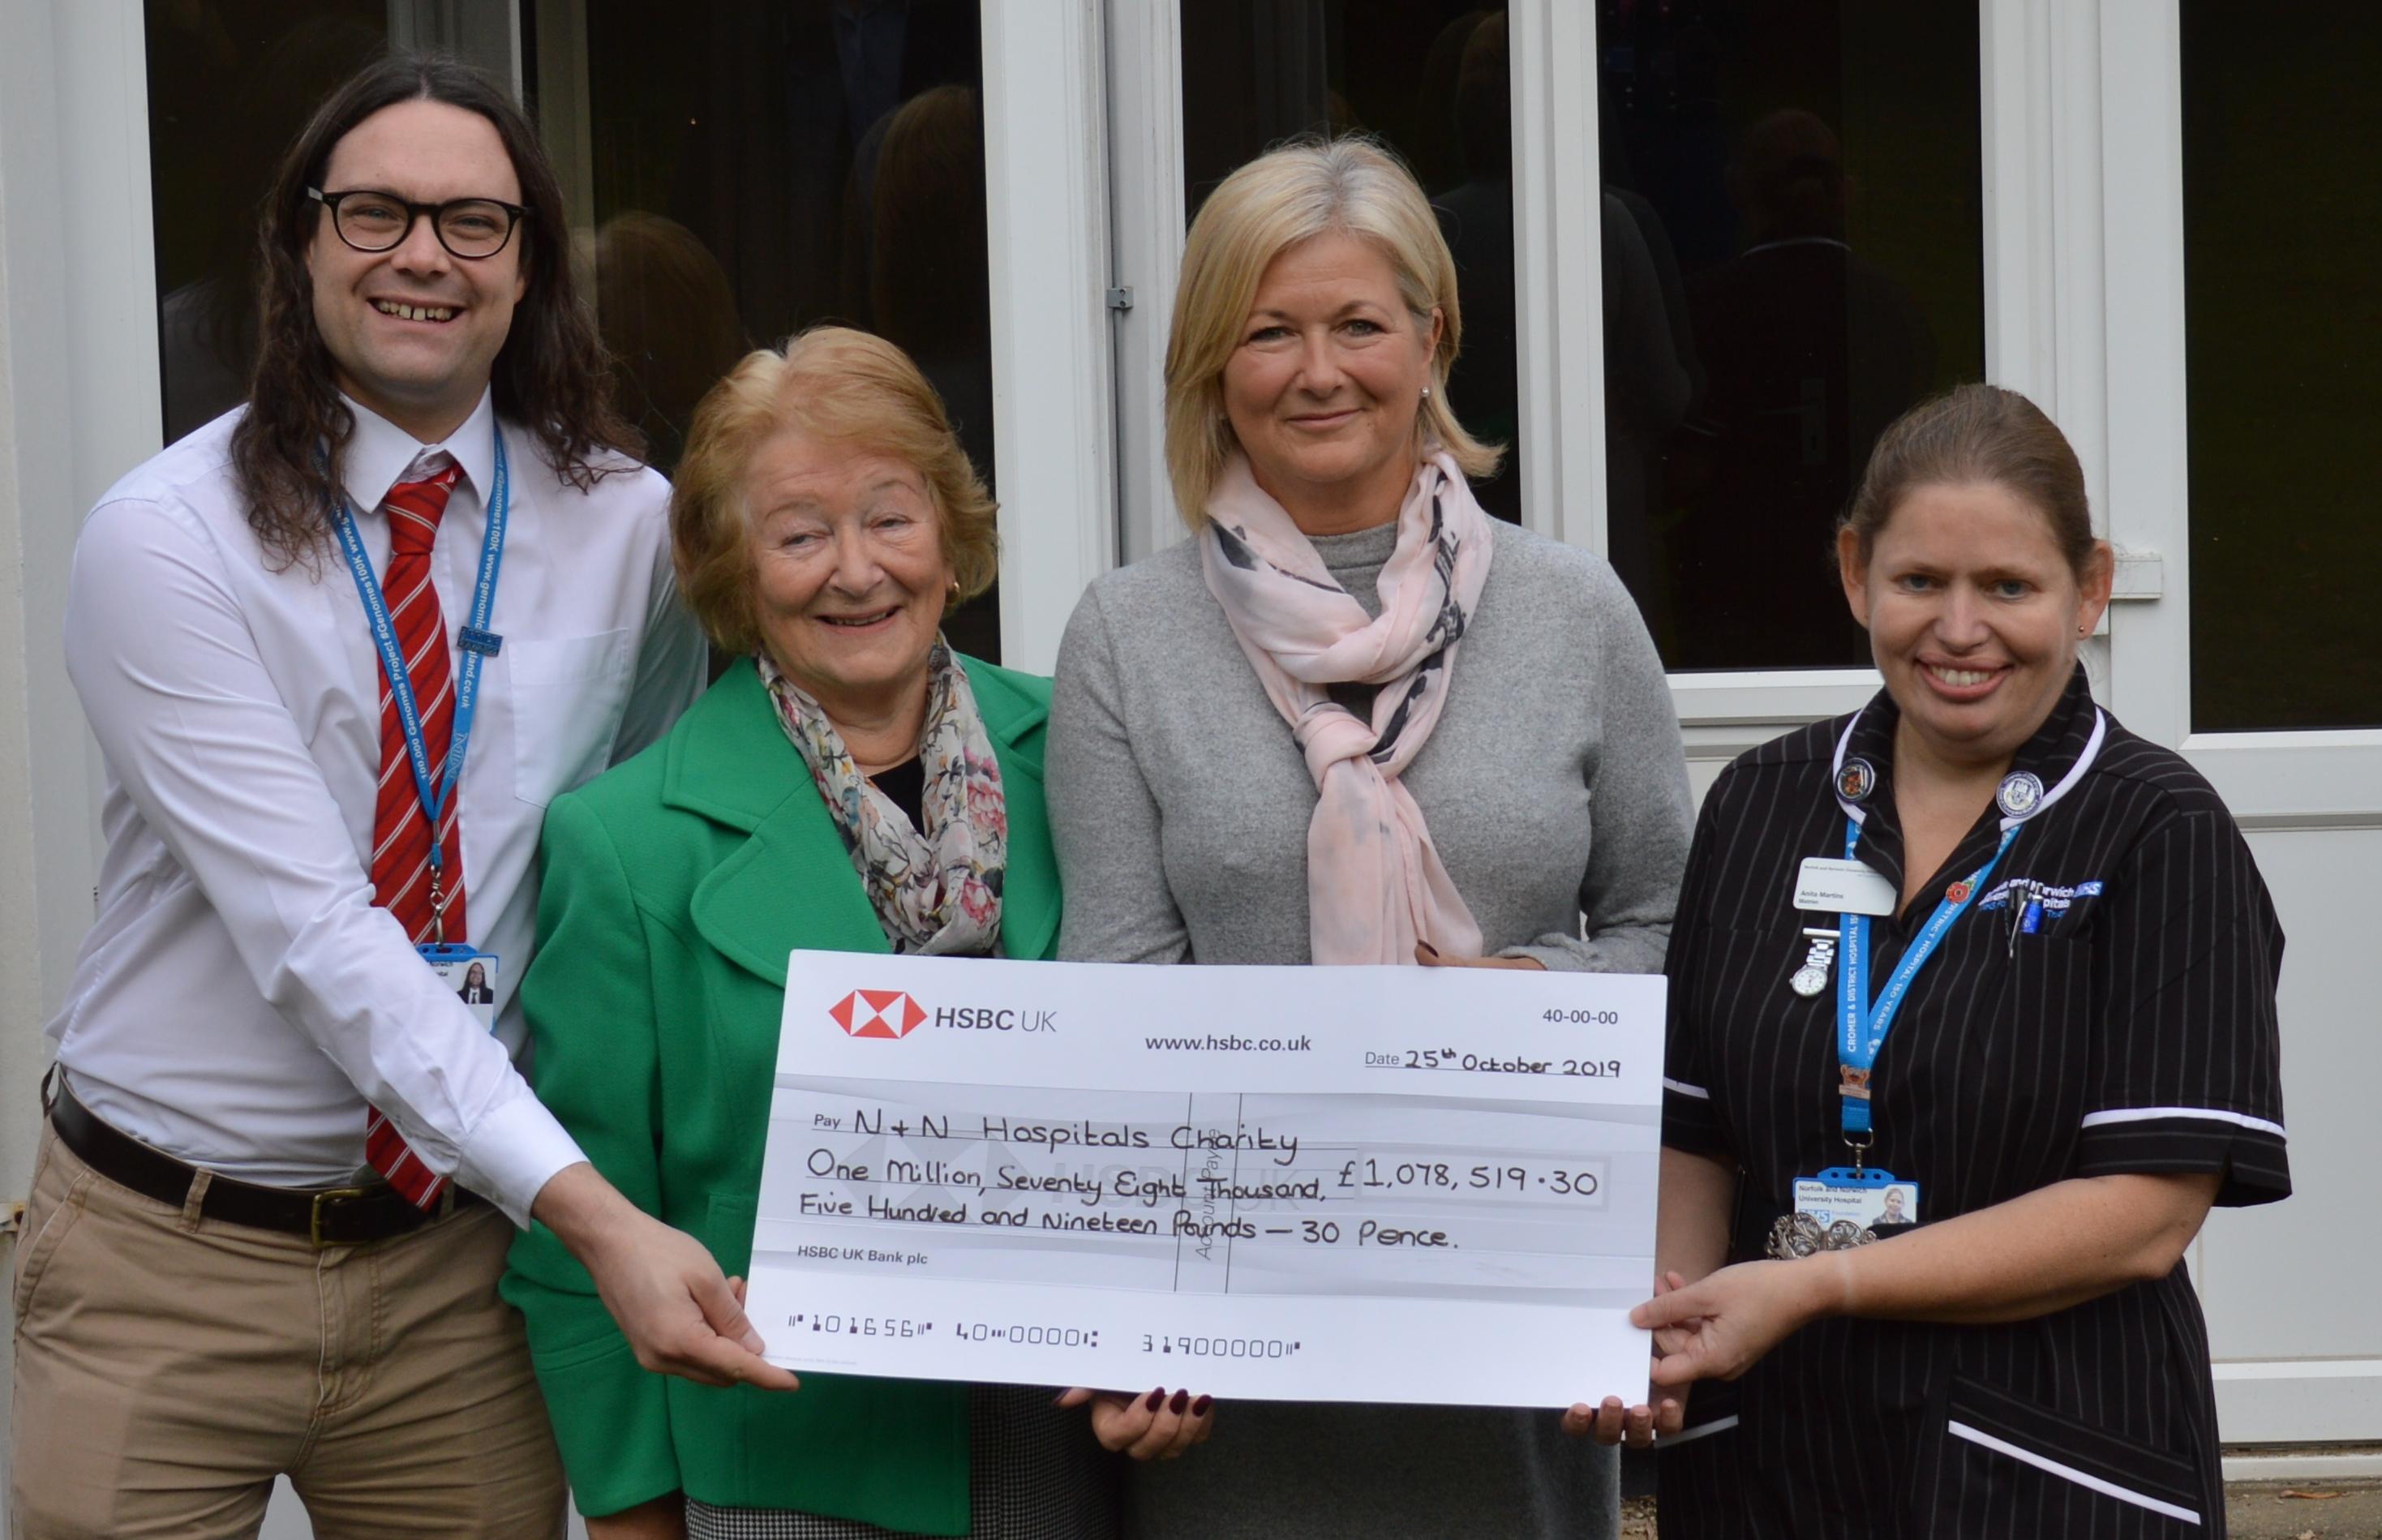 Cromer Hospital receives £1m legacy